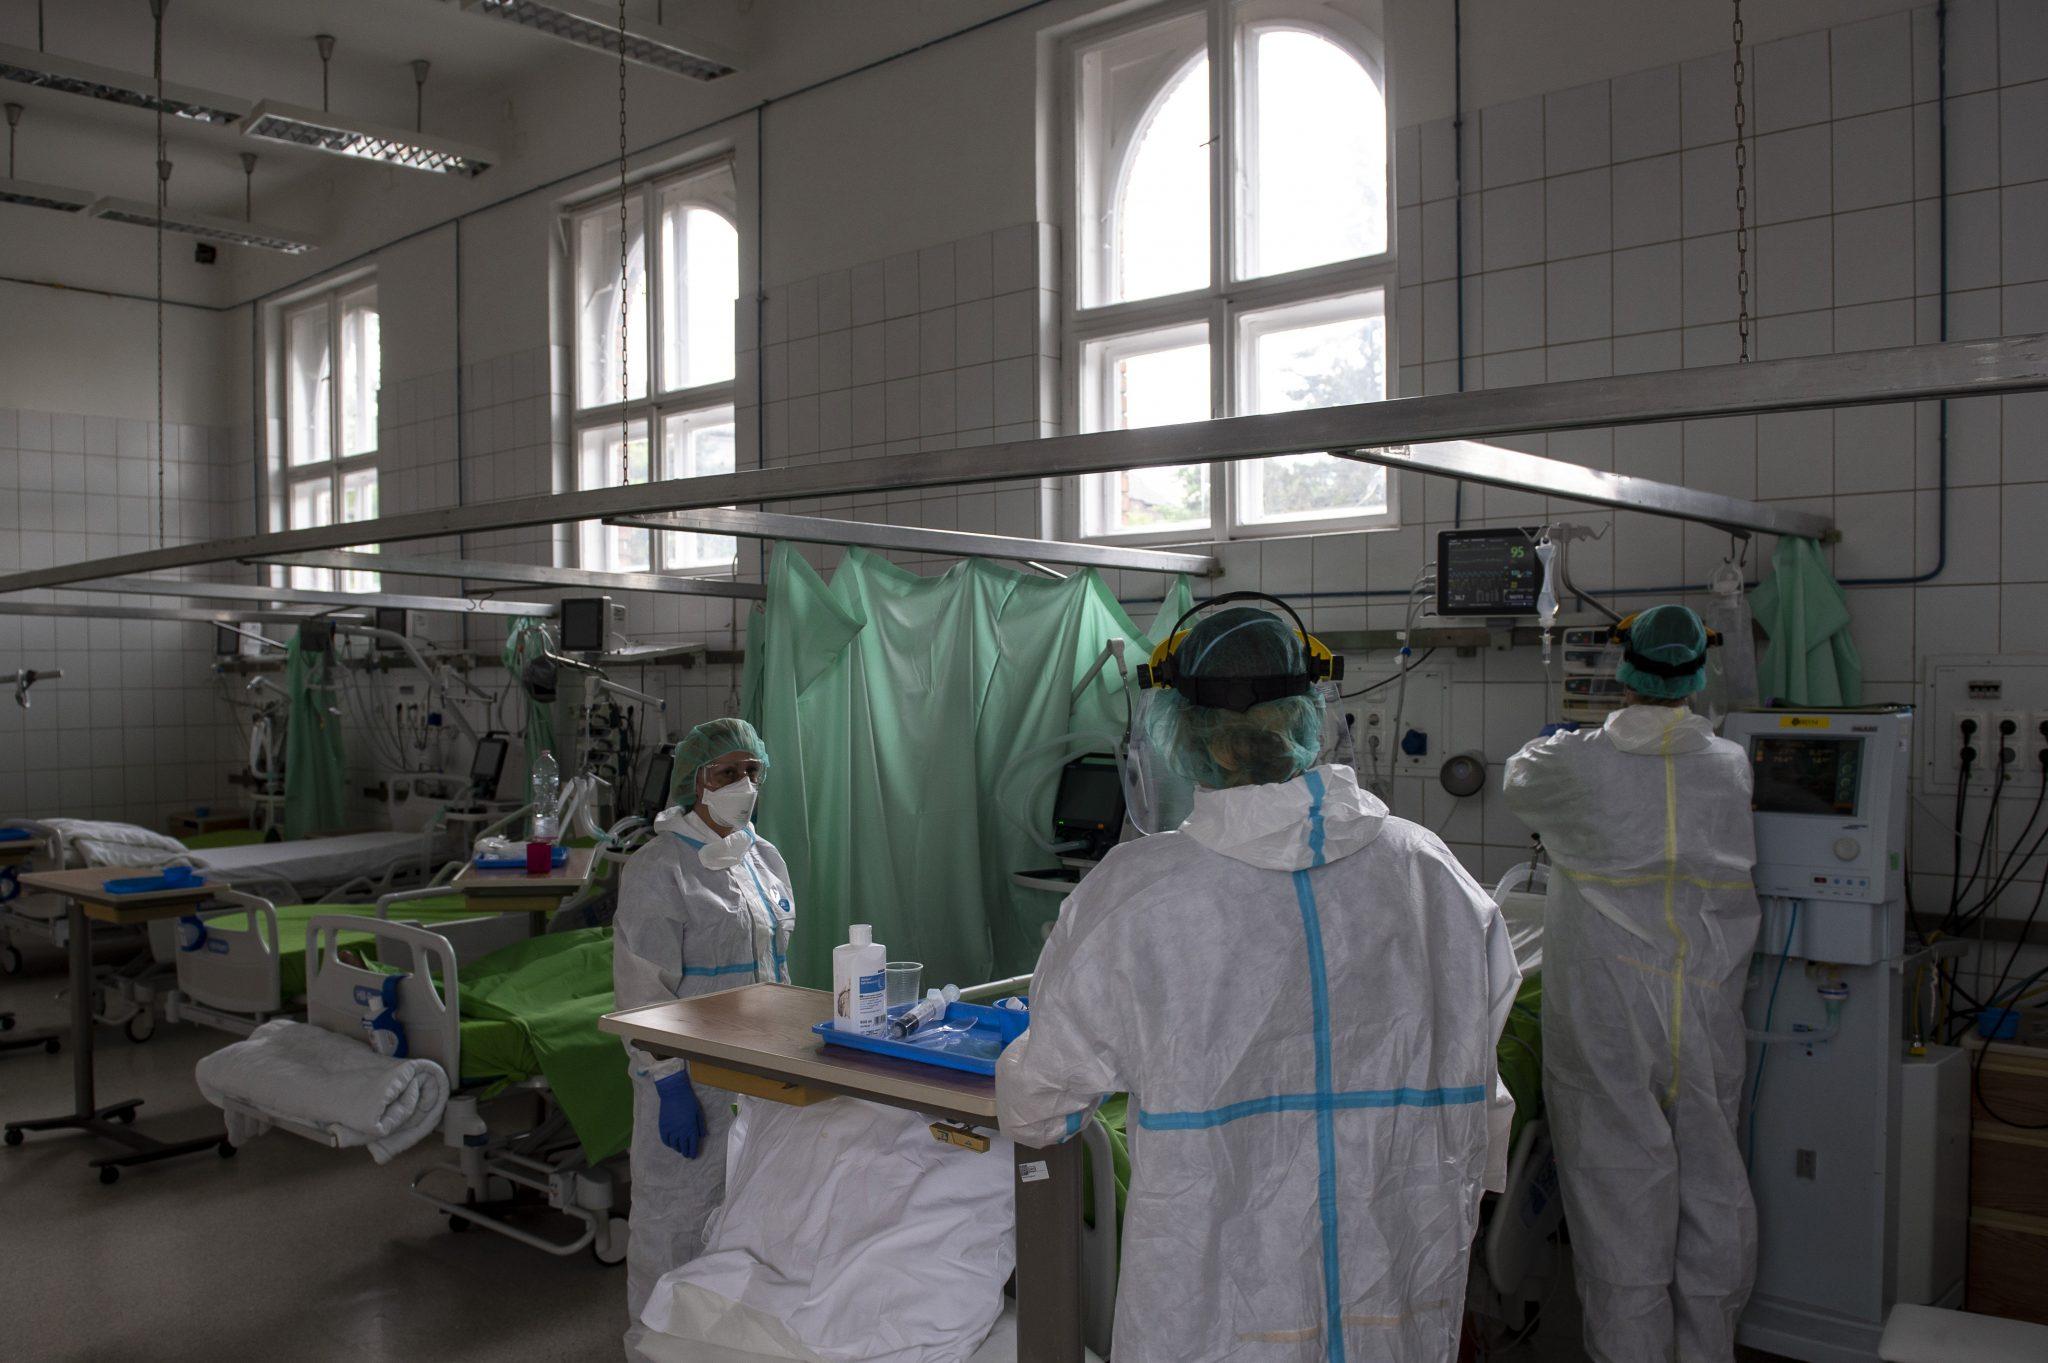 Coronavirus: 96 Fatalities, Infections Up 4,440